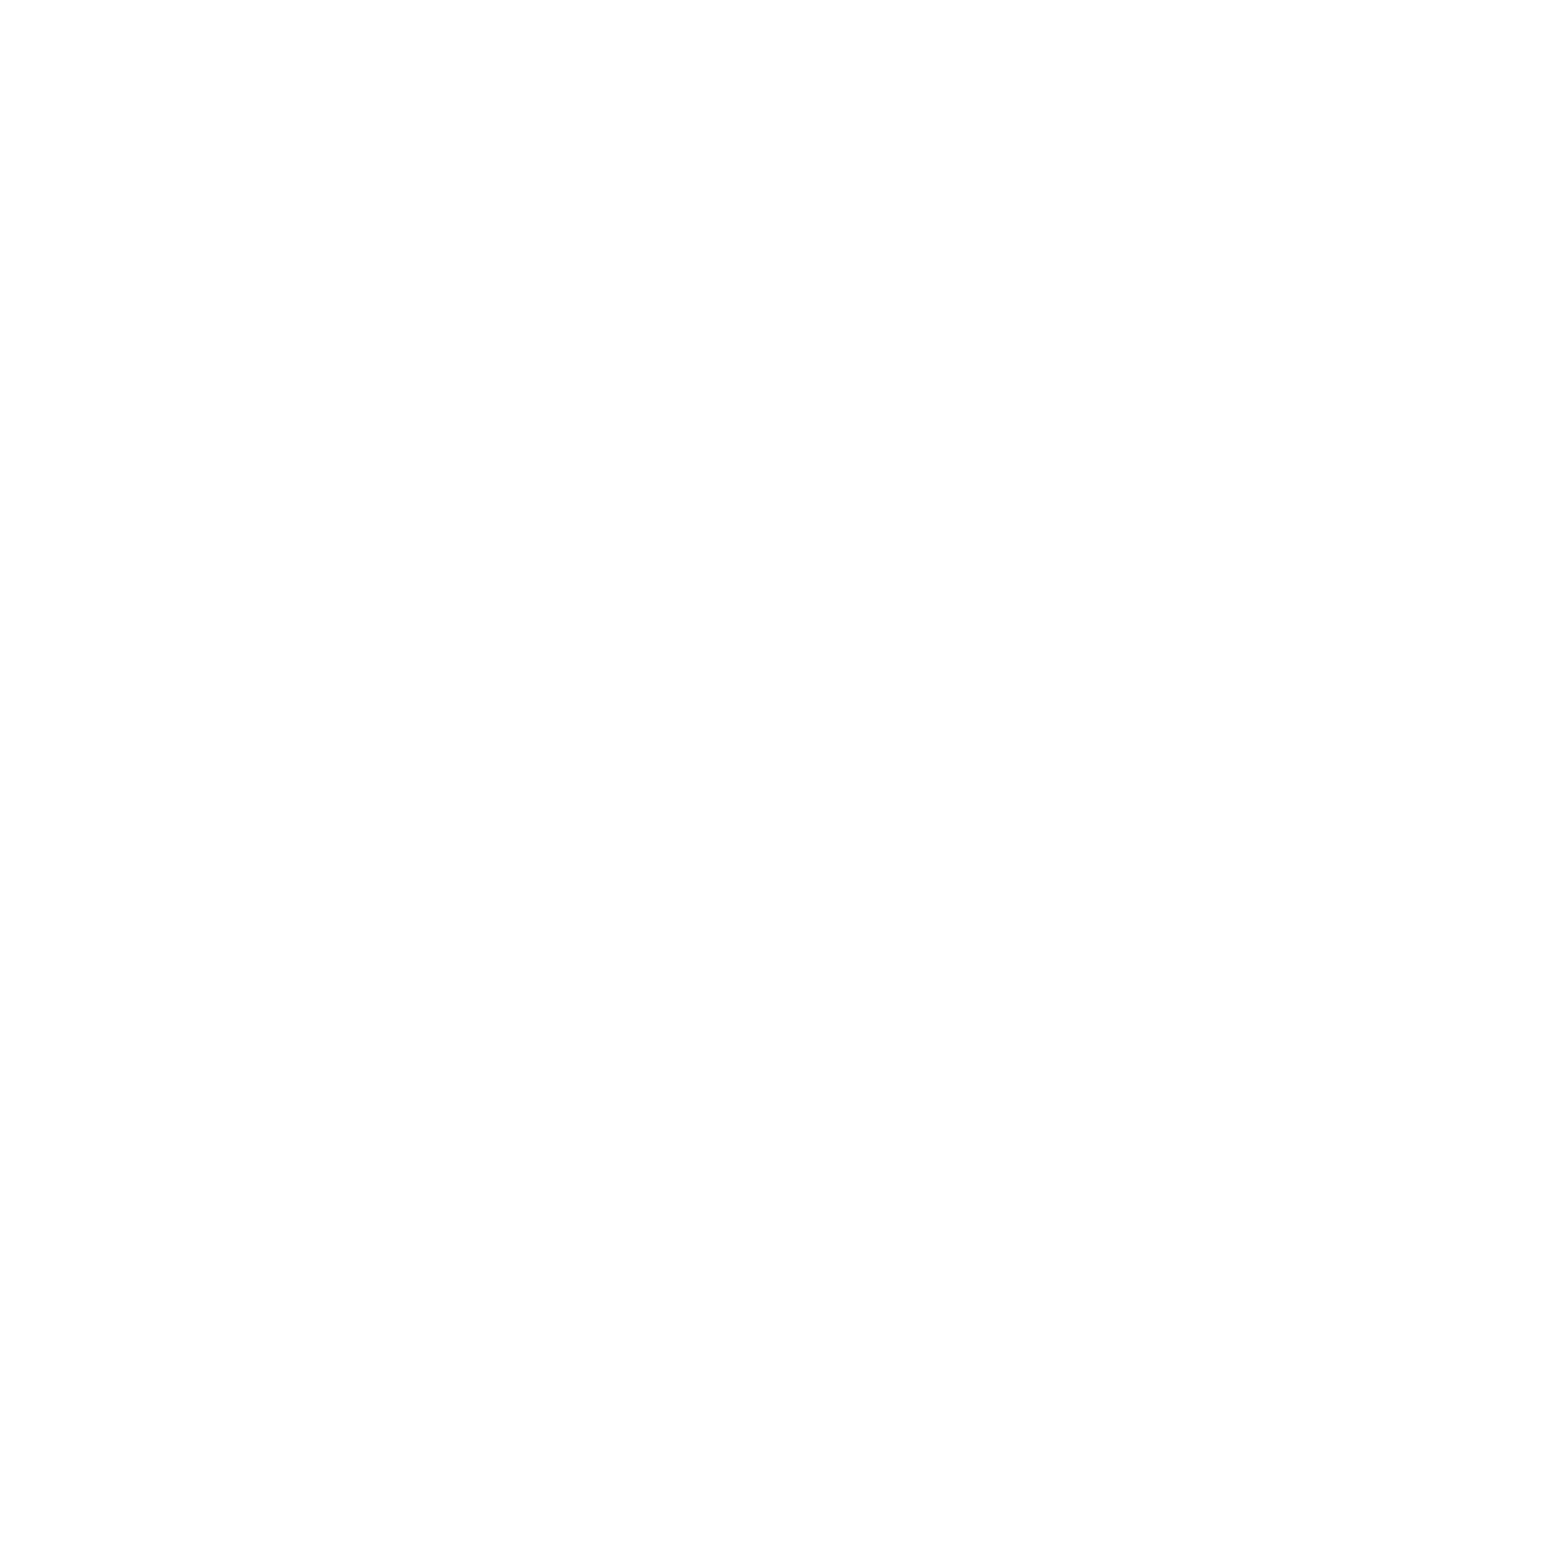 visum-oakley-logo.png